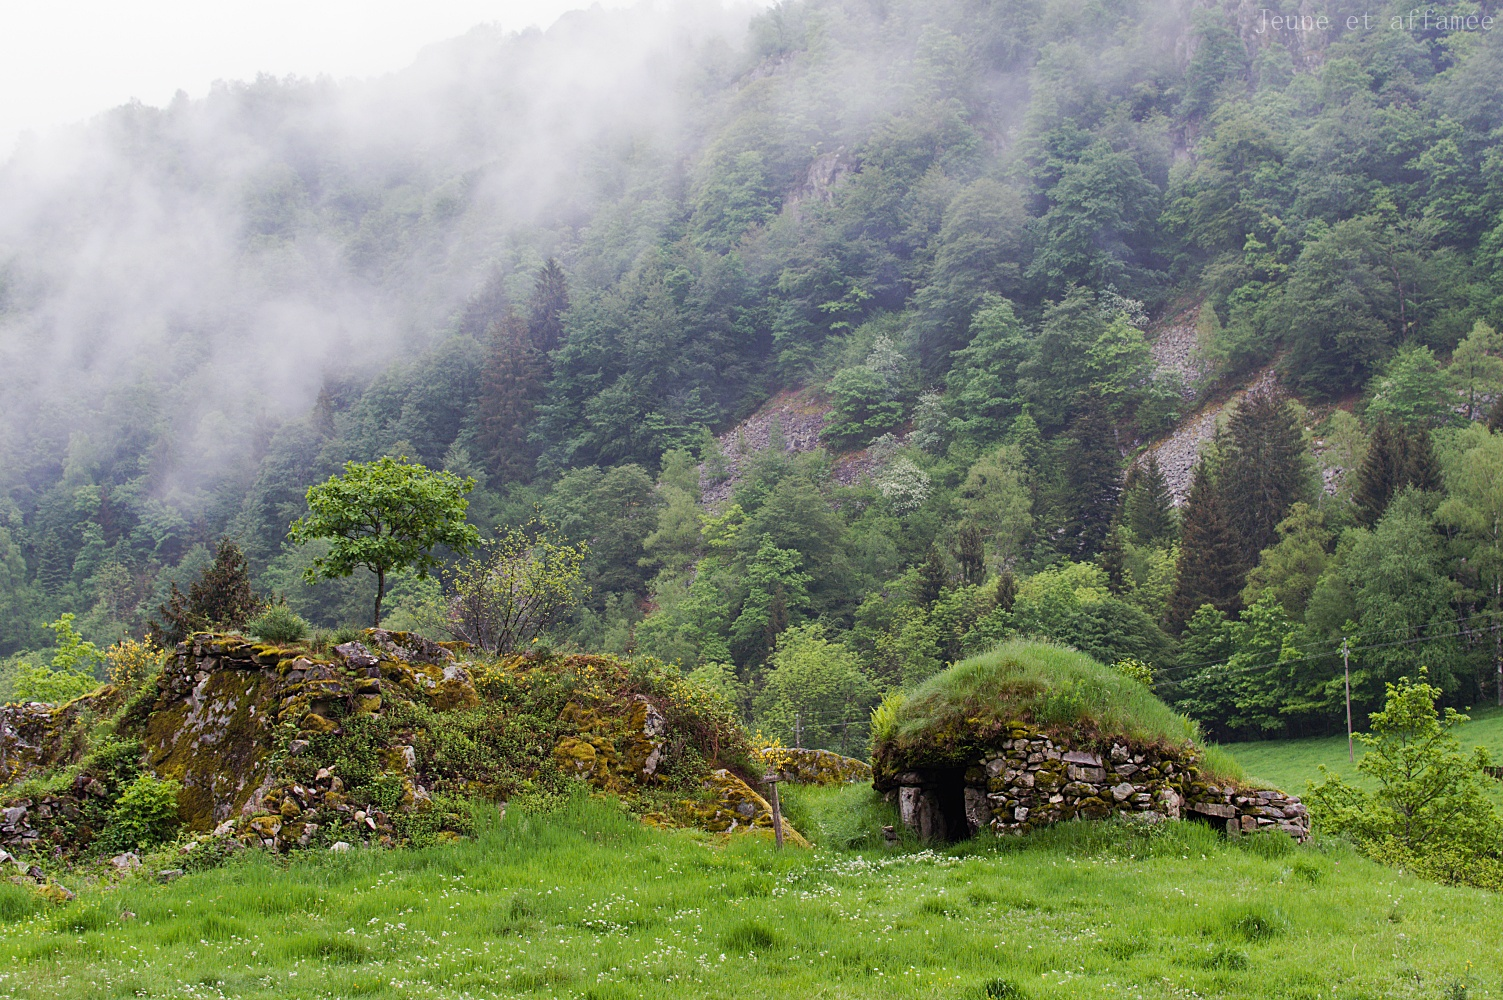 Cabane en pierre, dans le brouillard